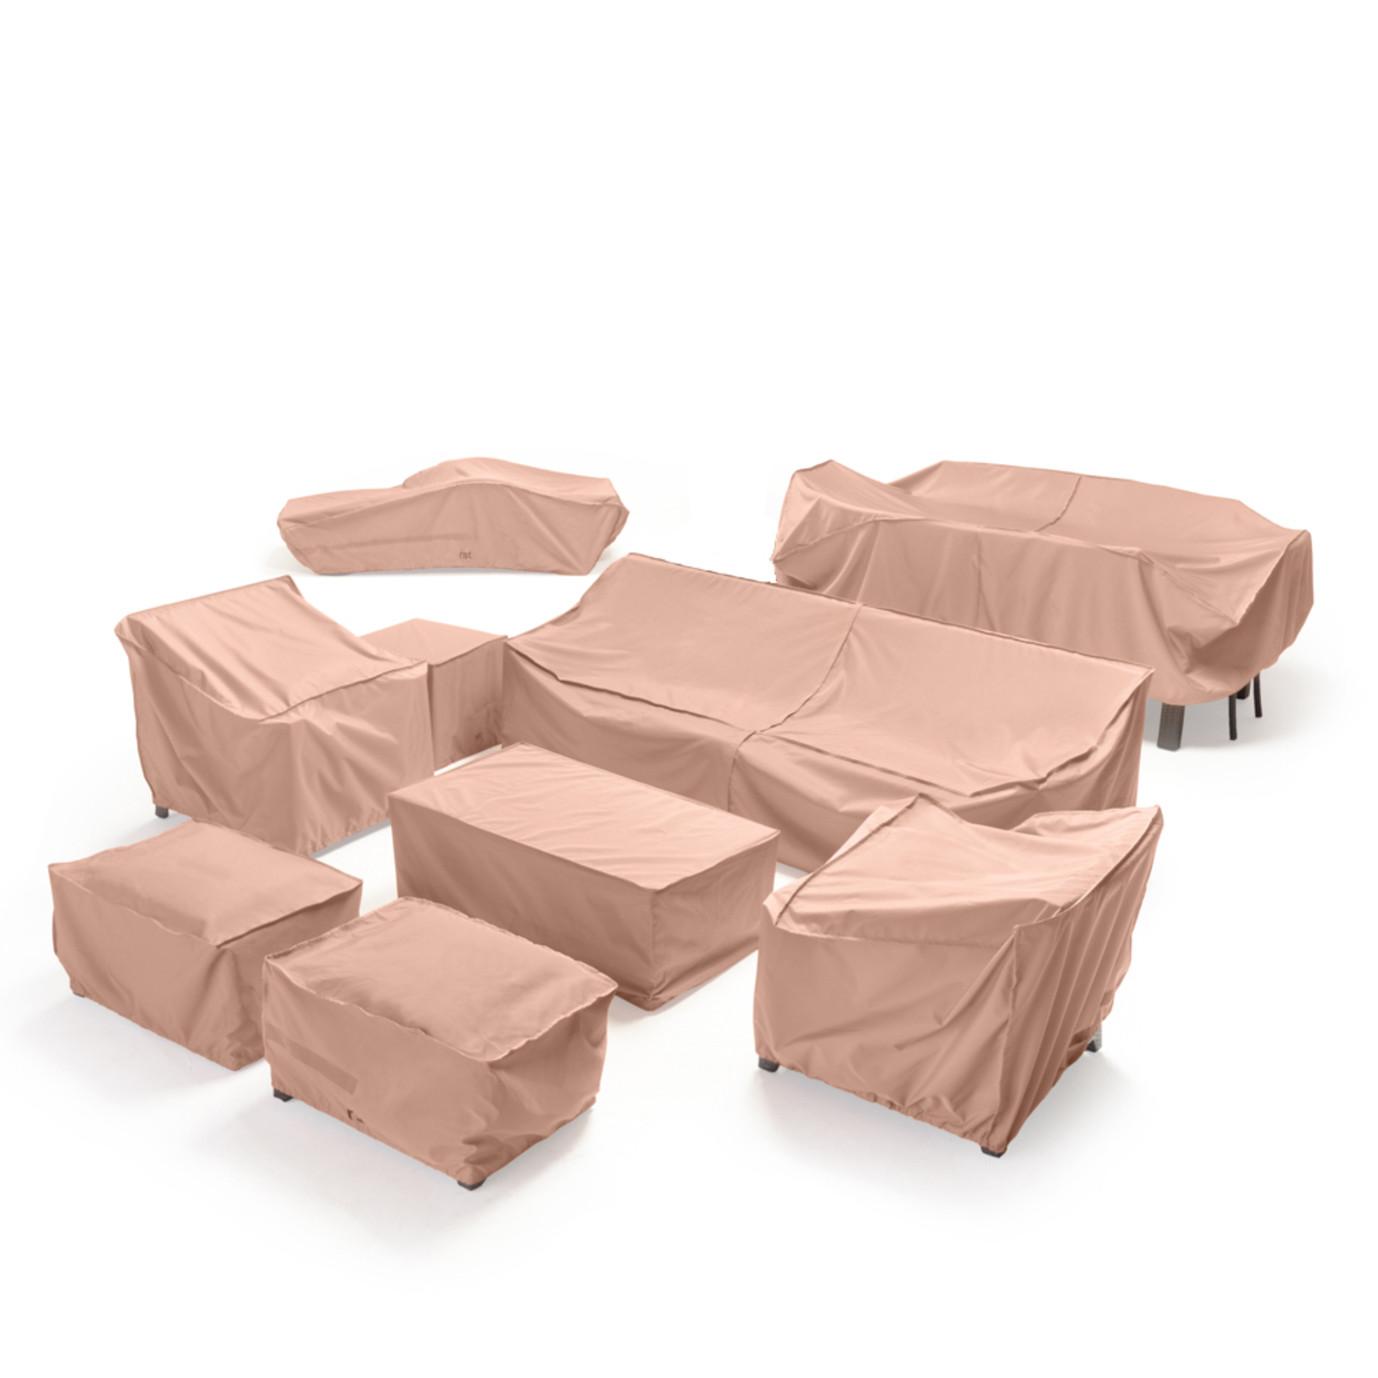 20pc Estate Collection Furniture Storage Cover Set